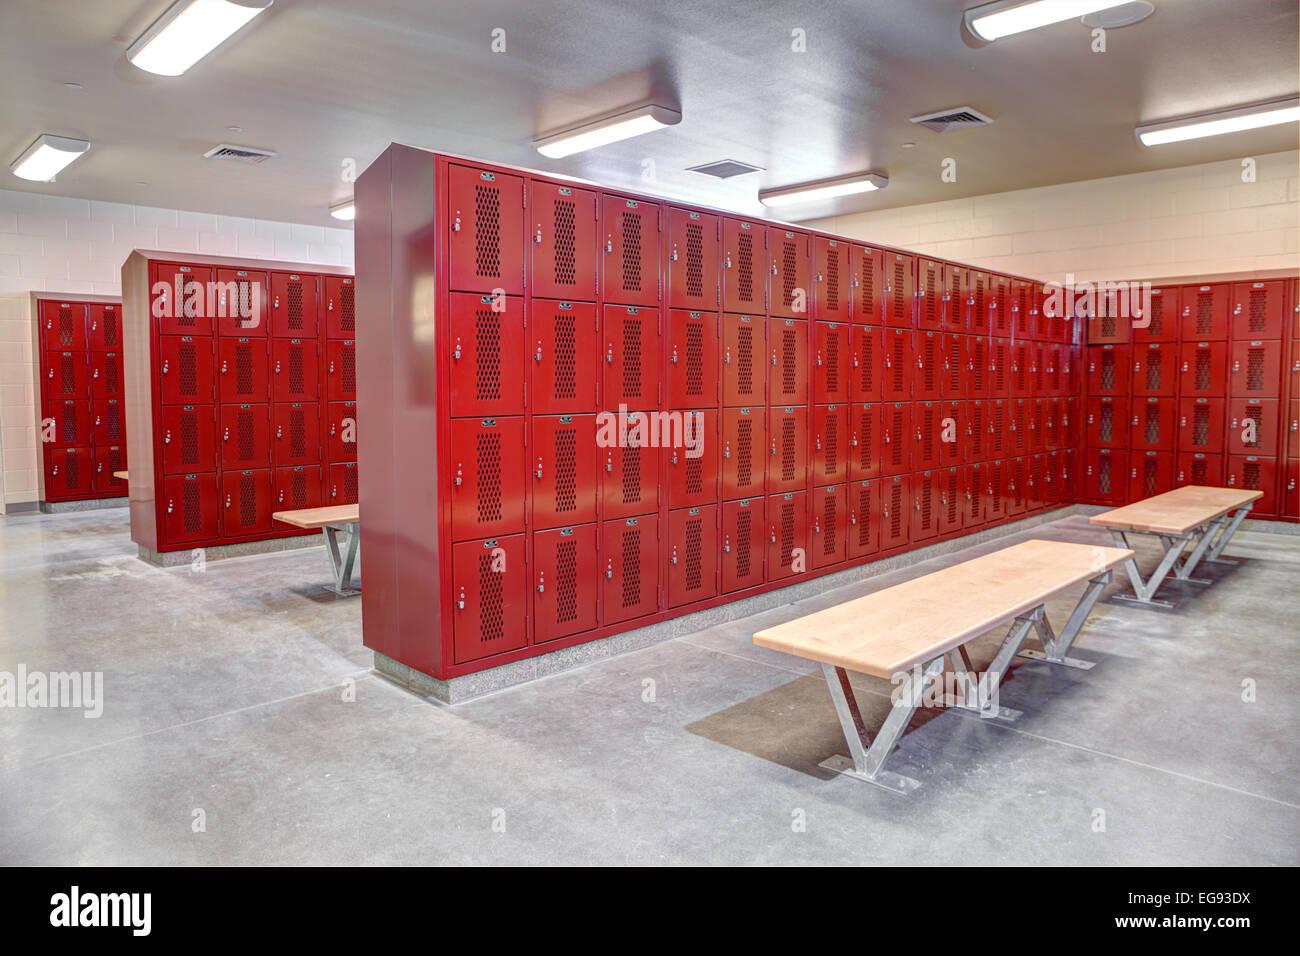 The interior of a High School locker room Stock Photo, Royalty ...